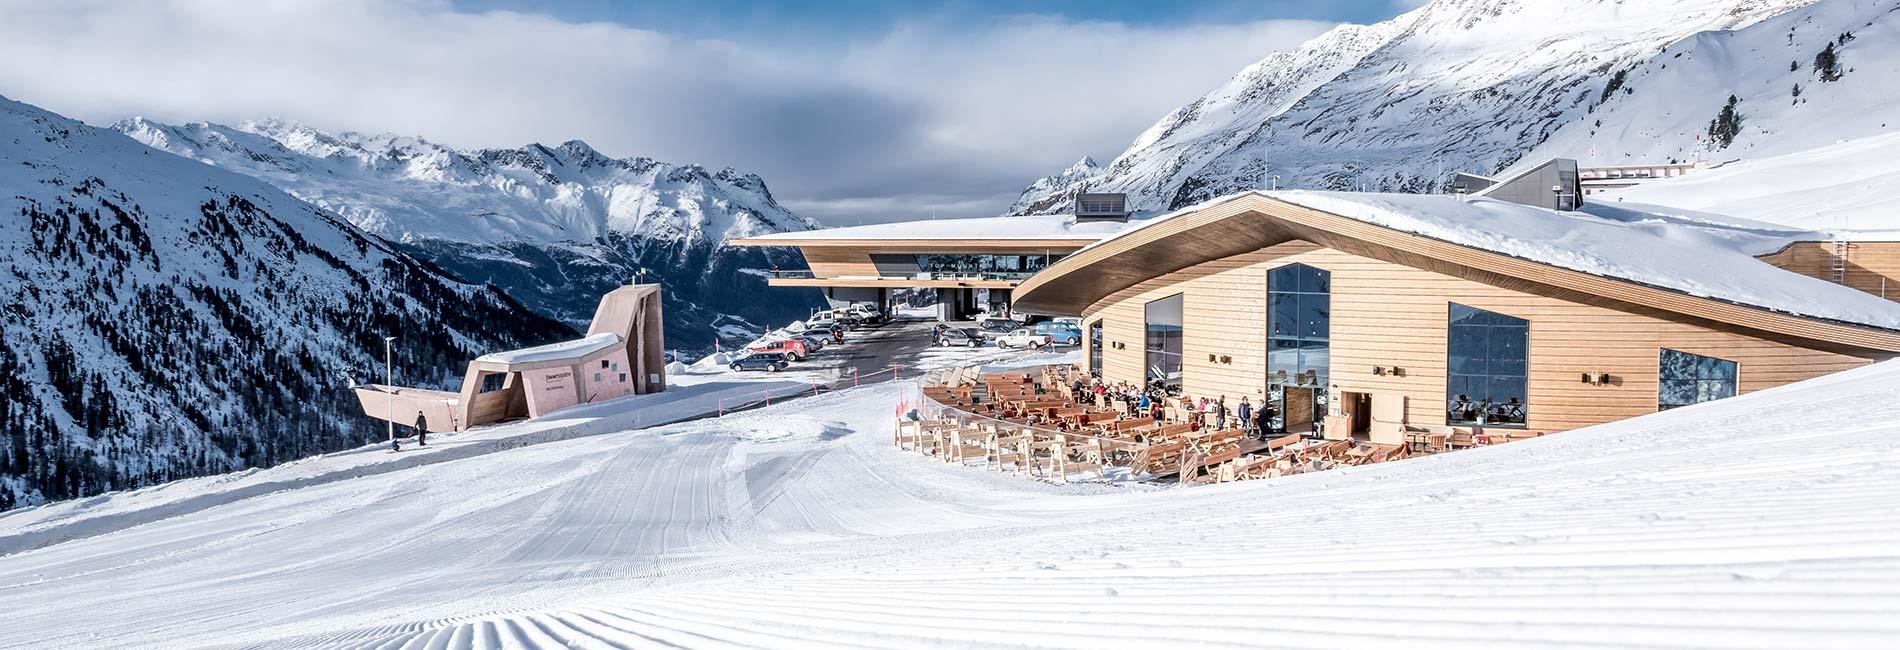 TOP Mountain Crosspoint Gastronomie im Skigebiet Obergurgl Hochgurgl Sölden